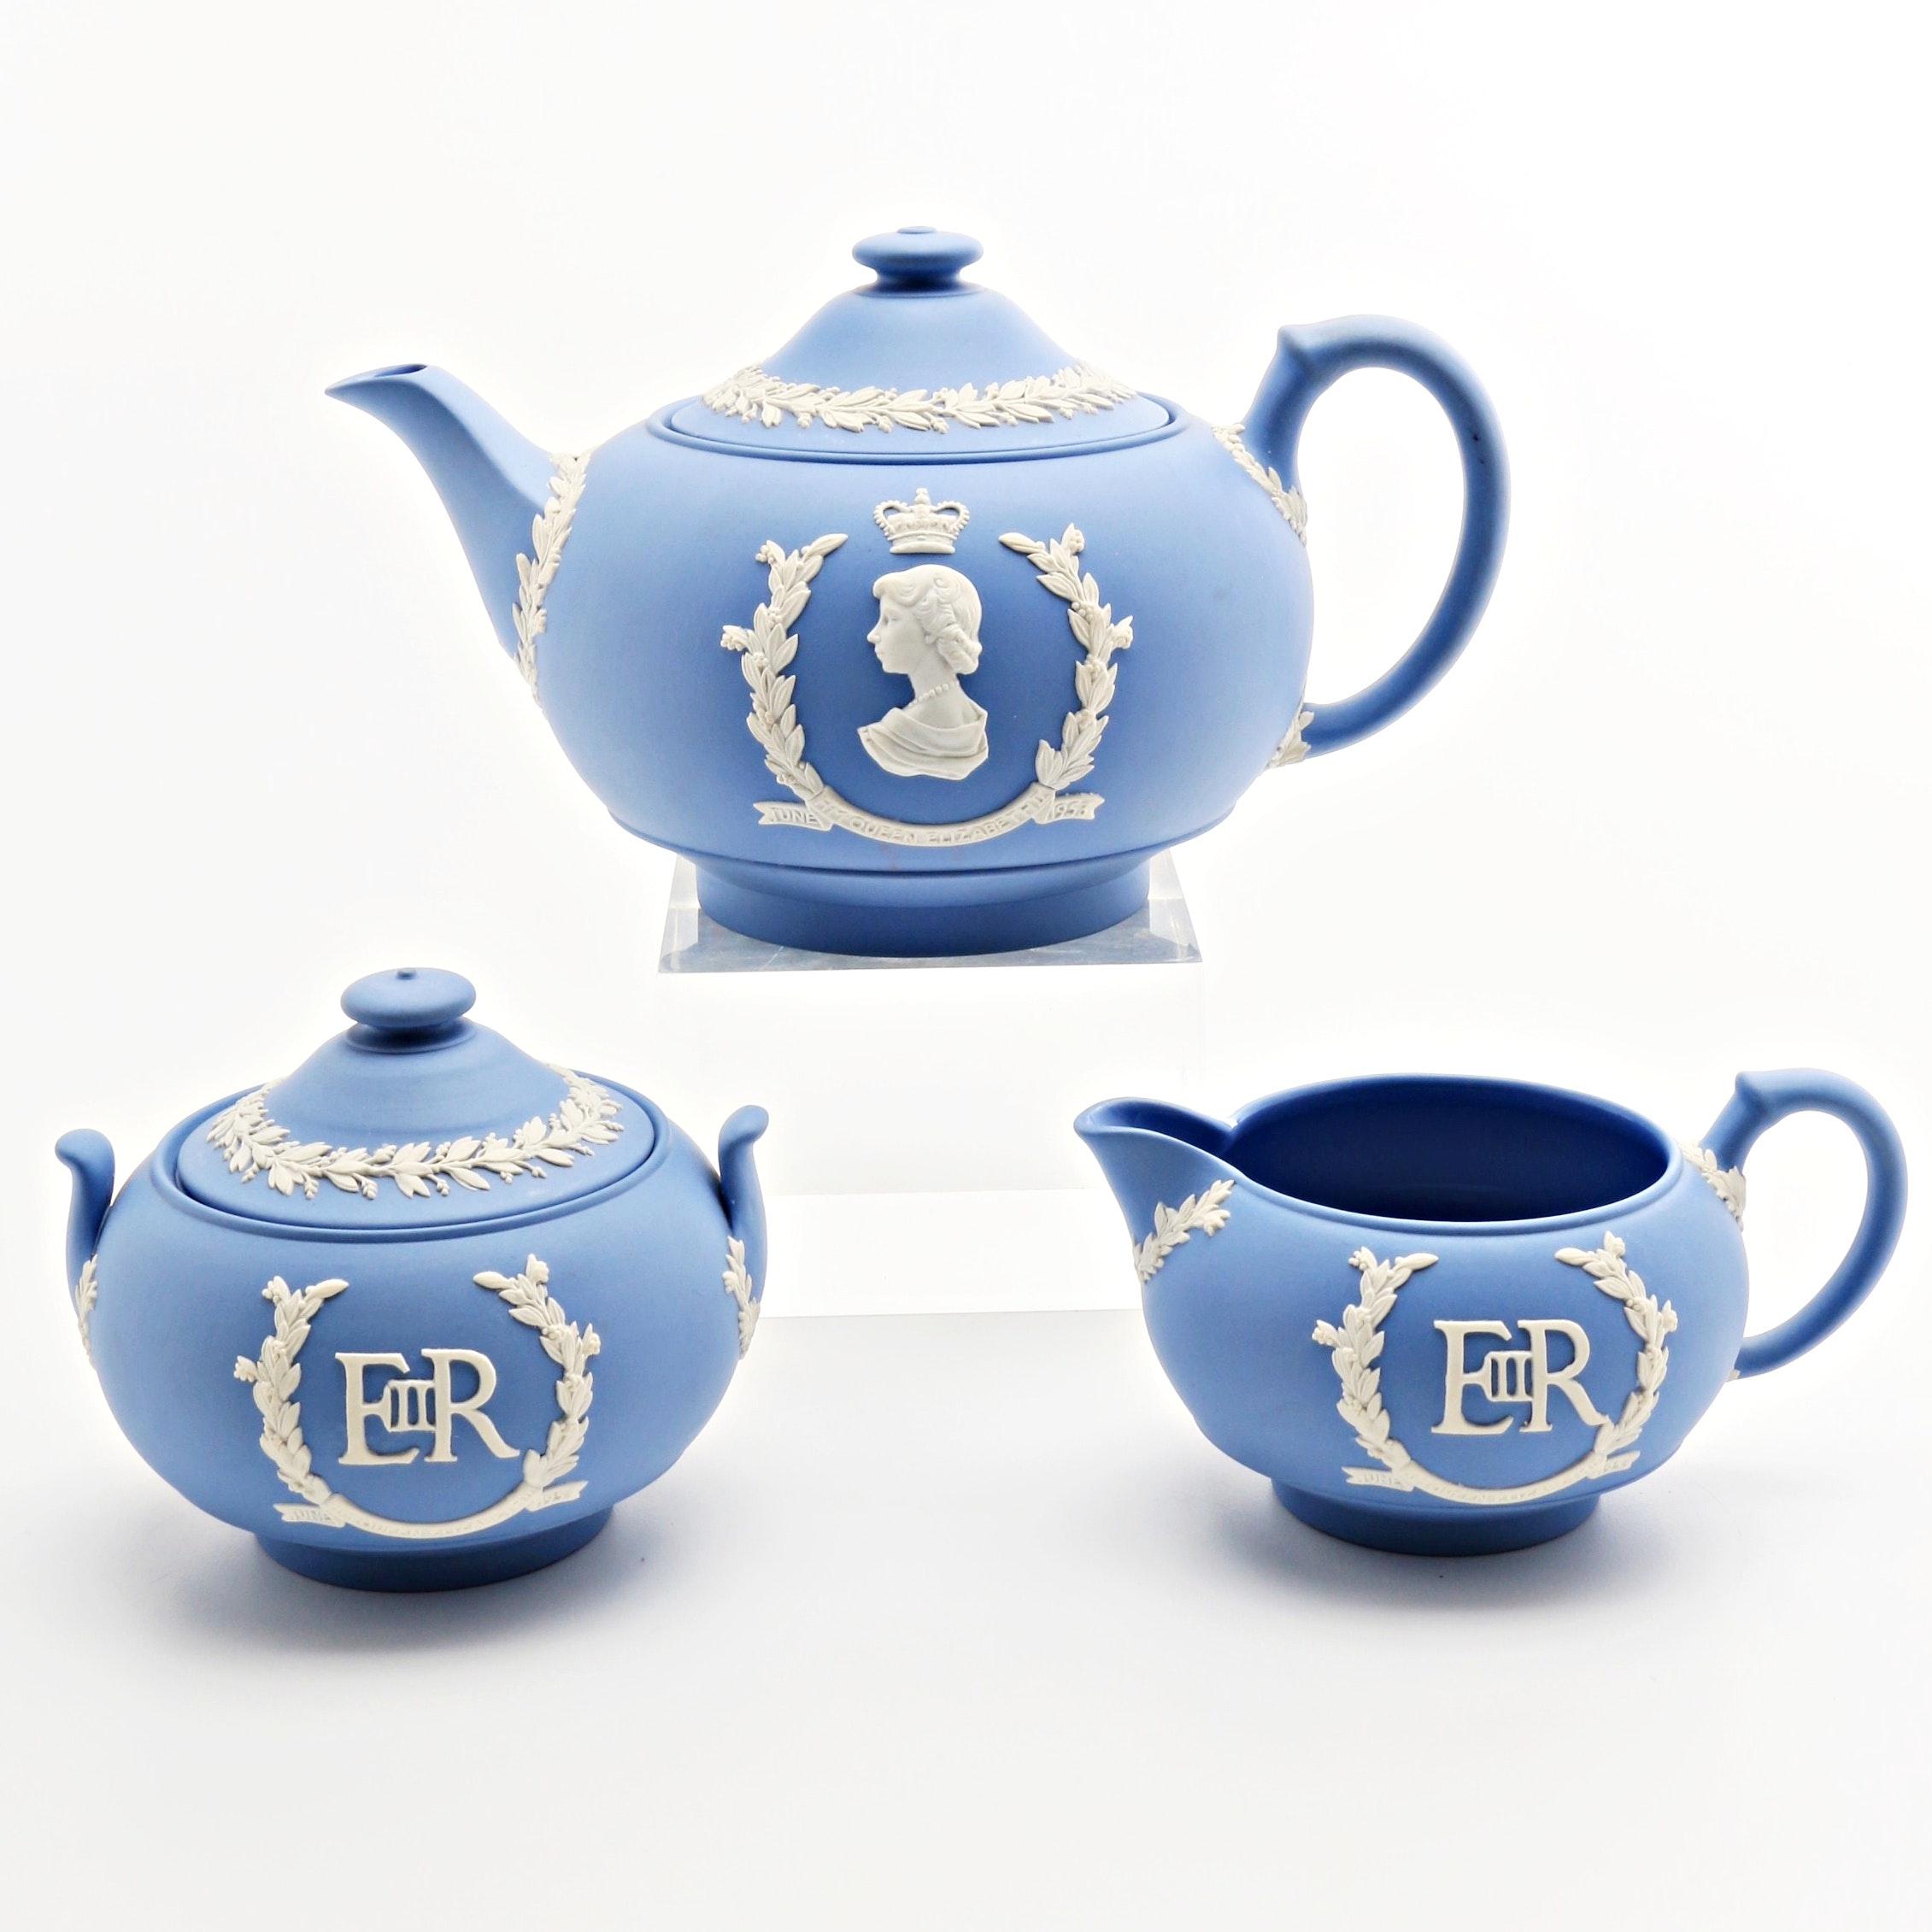 1953 Commemorative  Wedgwood Jasperware Tea Pot, Sugar Bowl and Creamer